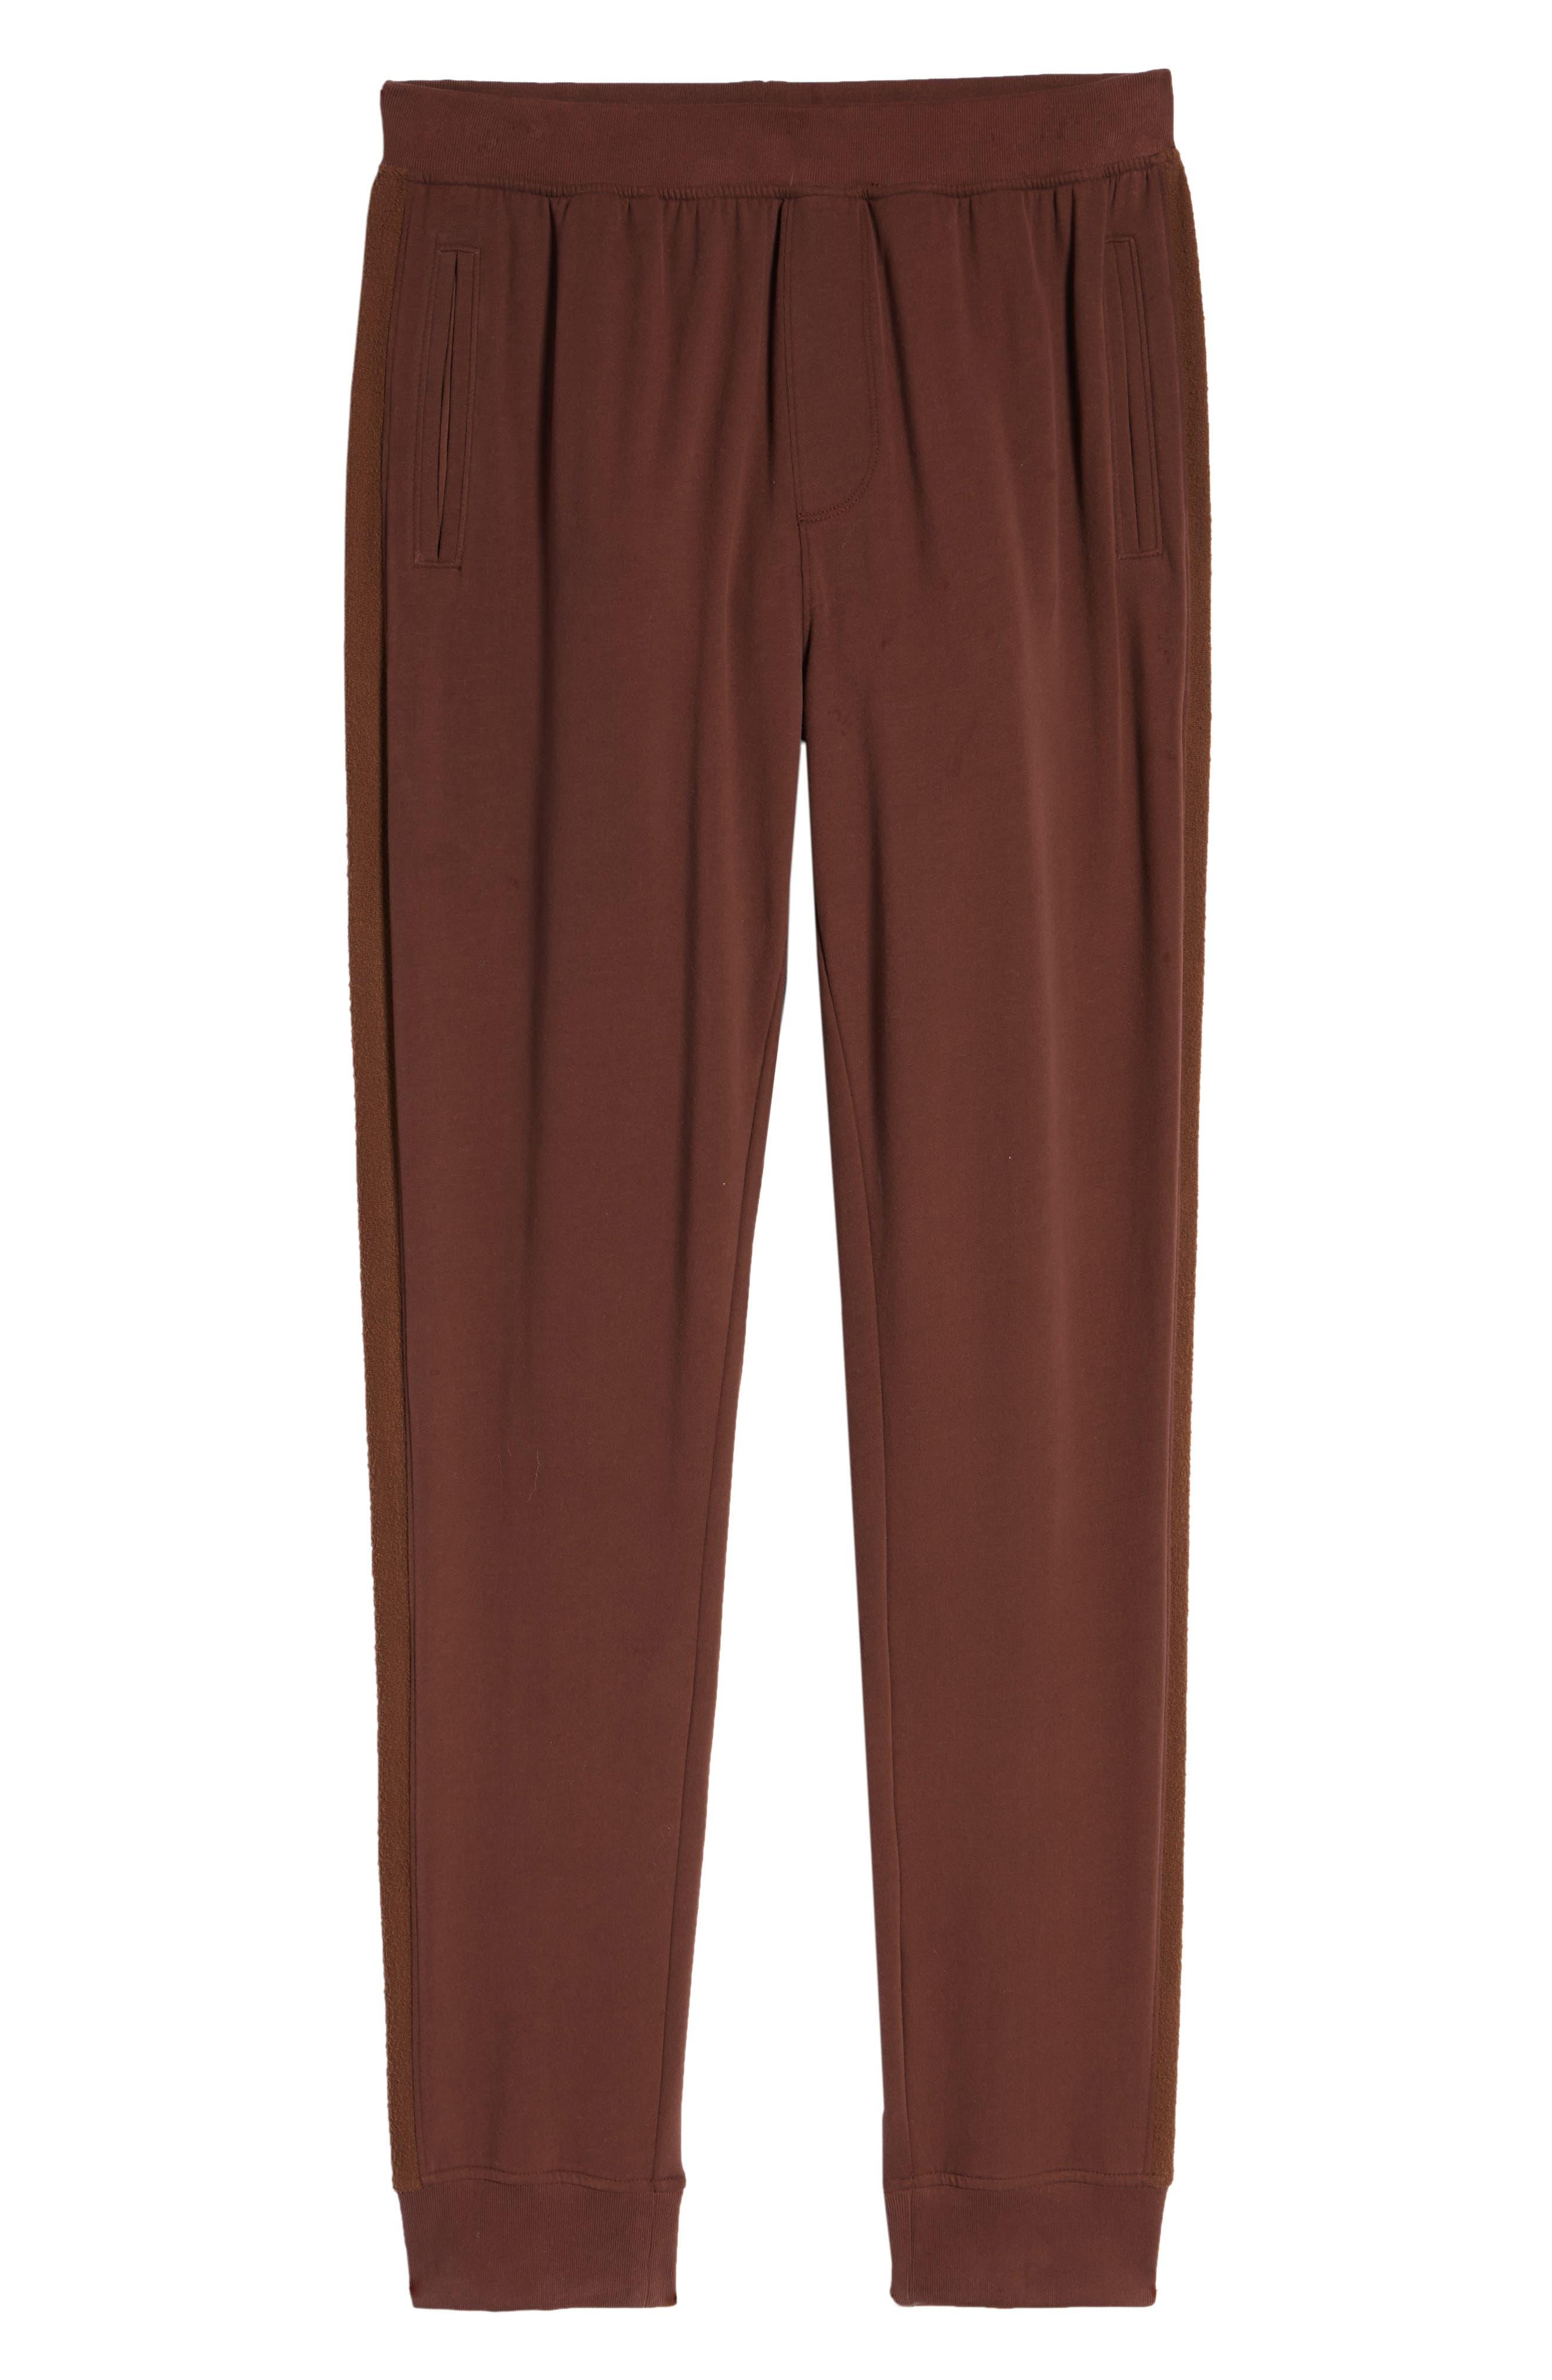 Slim Fit Sweatpants,                             Alternate thumbnail 6, color,                             930